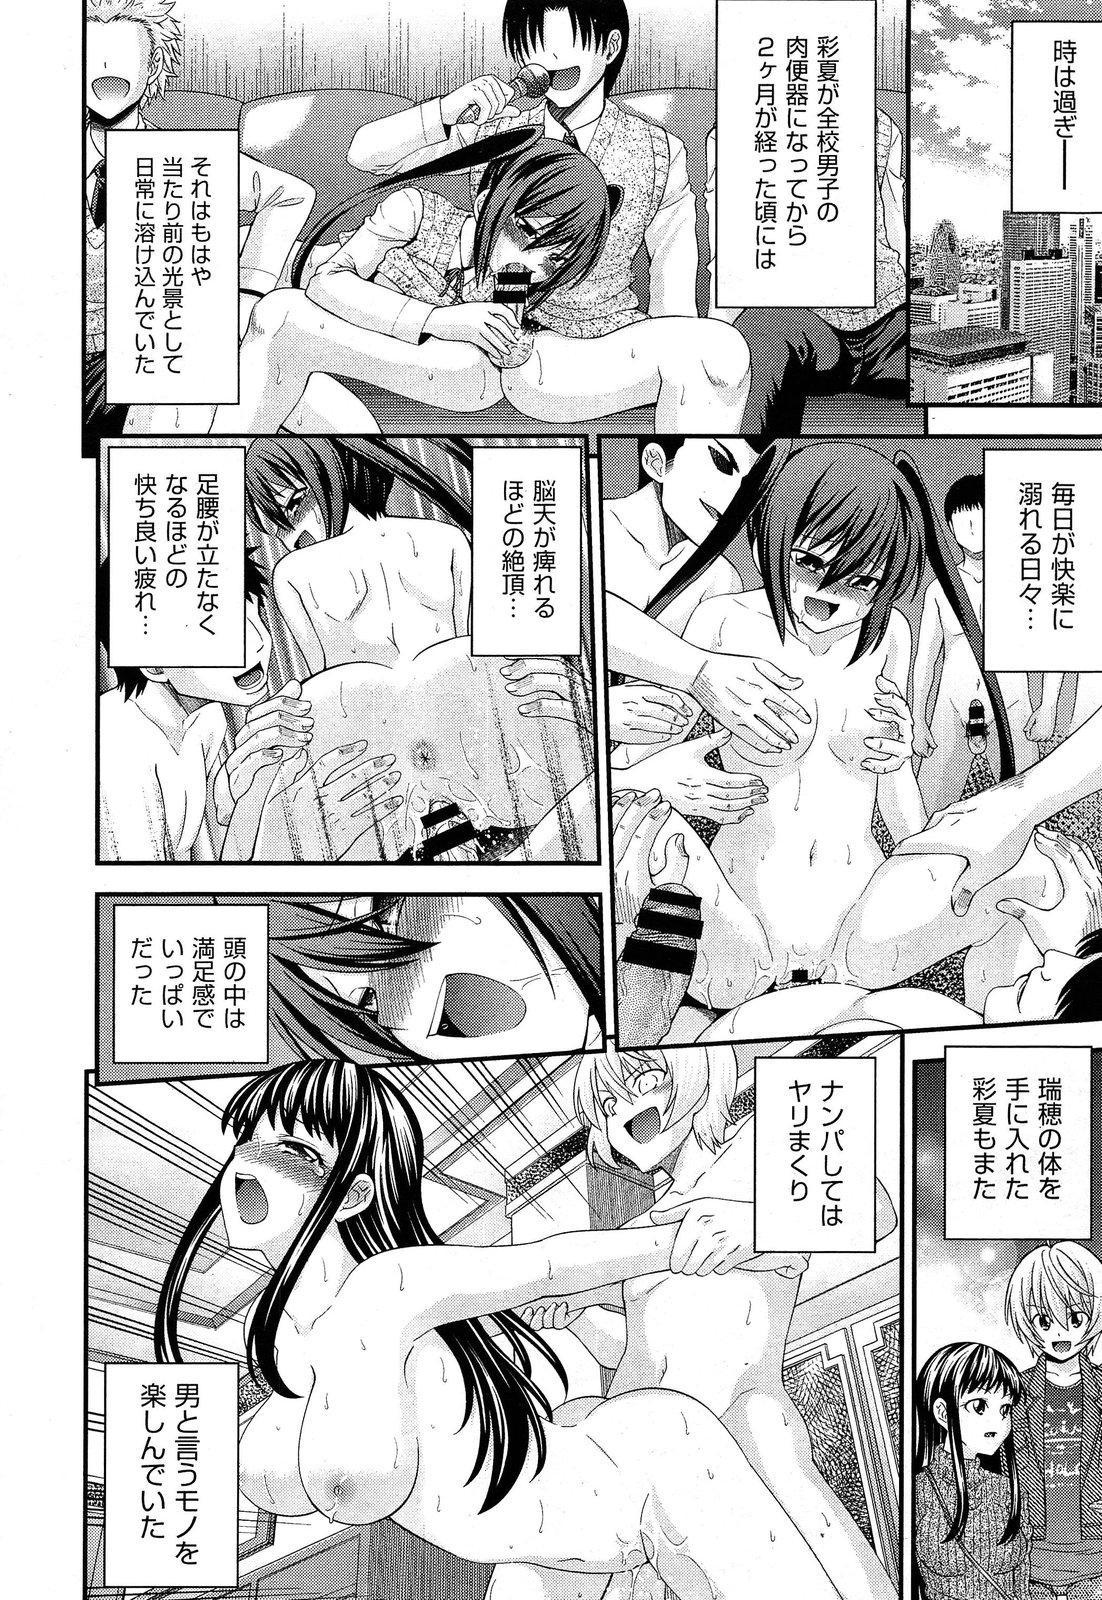 Kyoudai Replace 96